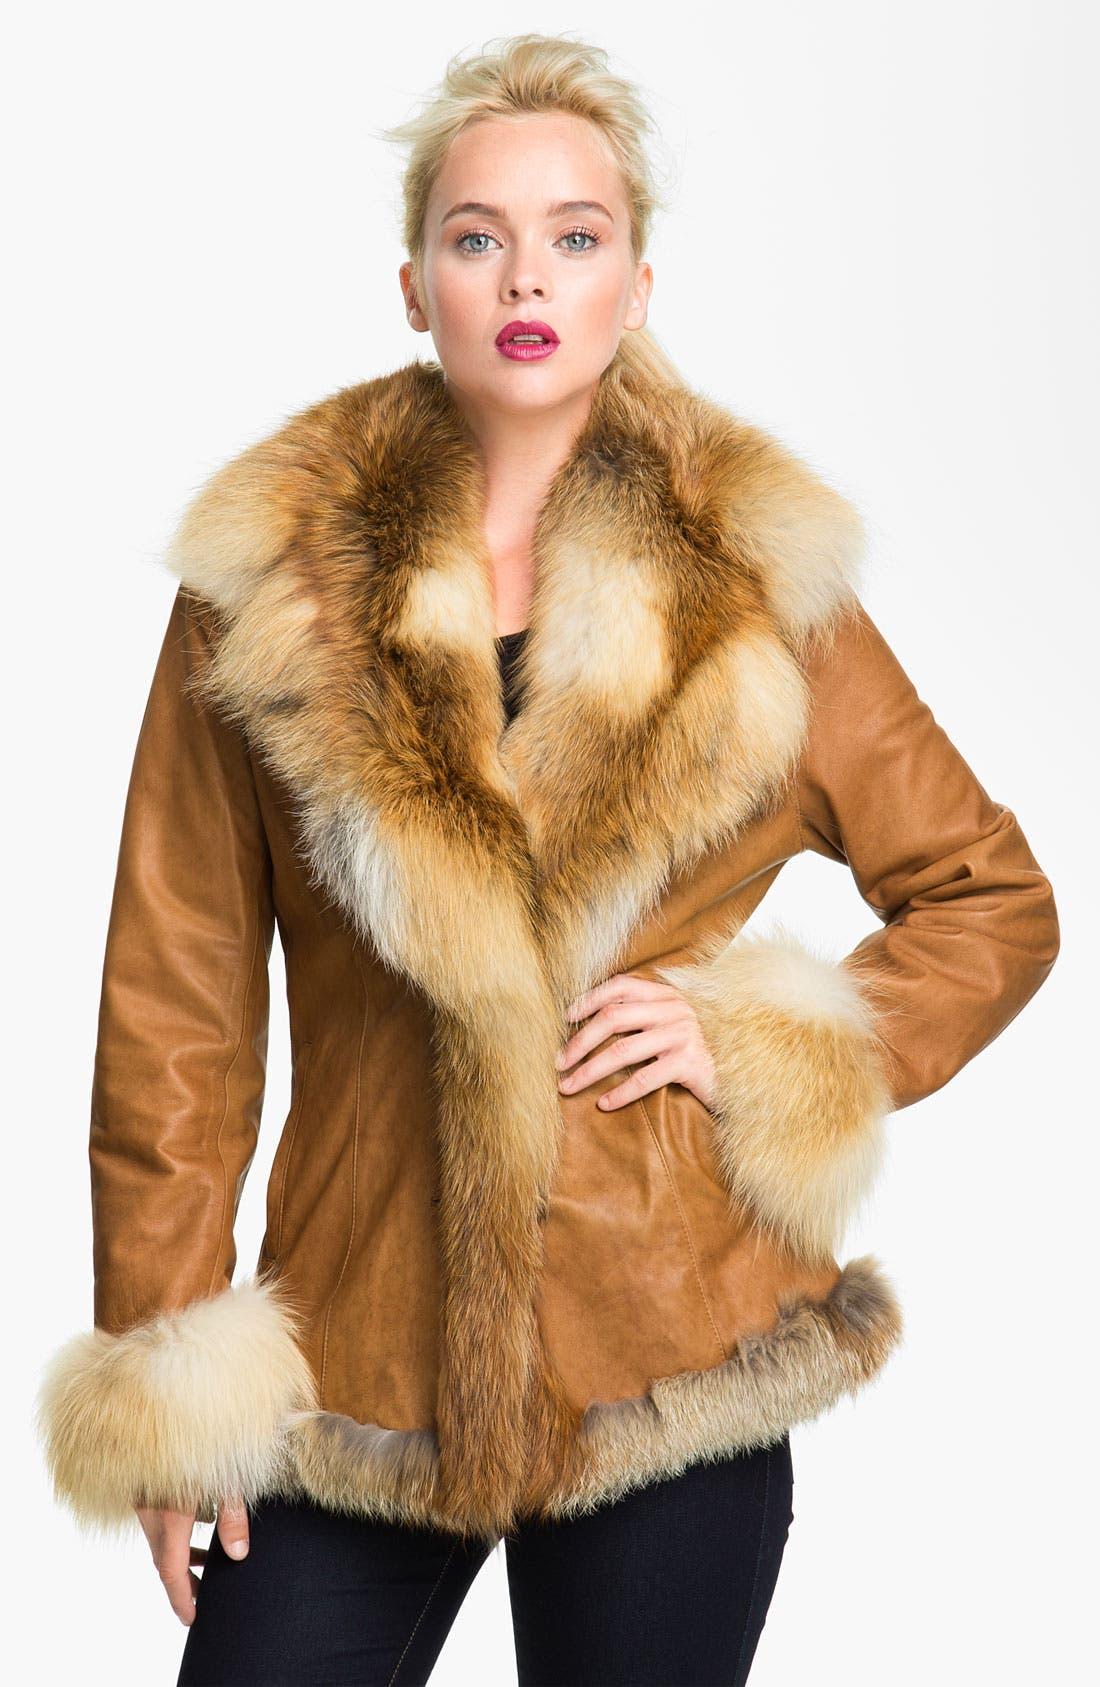 Alternate Image 1 Selected - Chosen Furs Lambskin Leather Coat with Fox Fur Trim